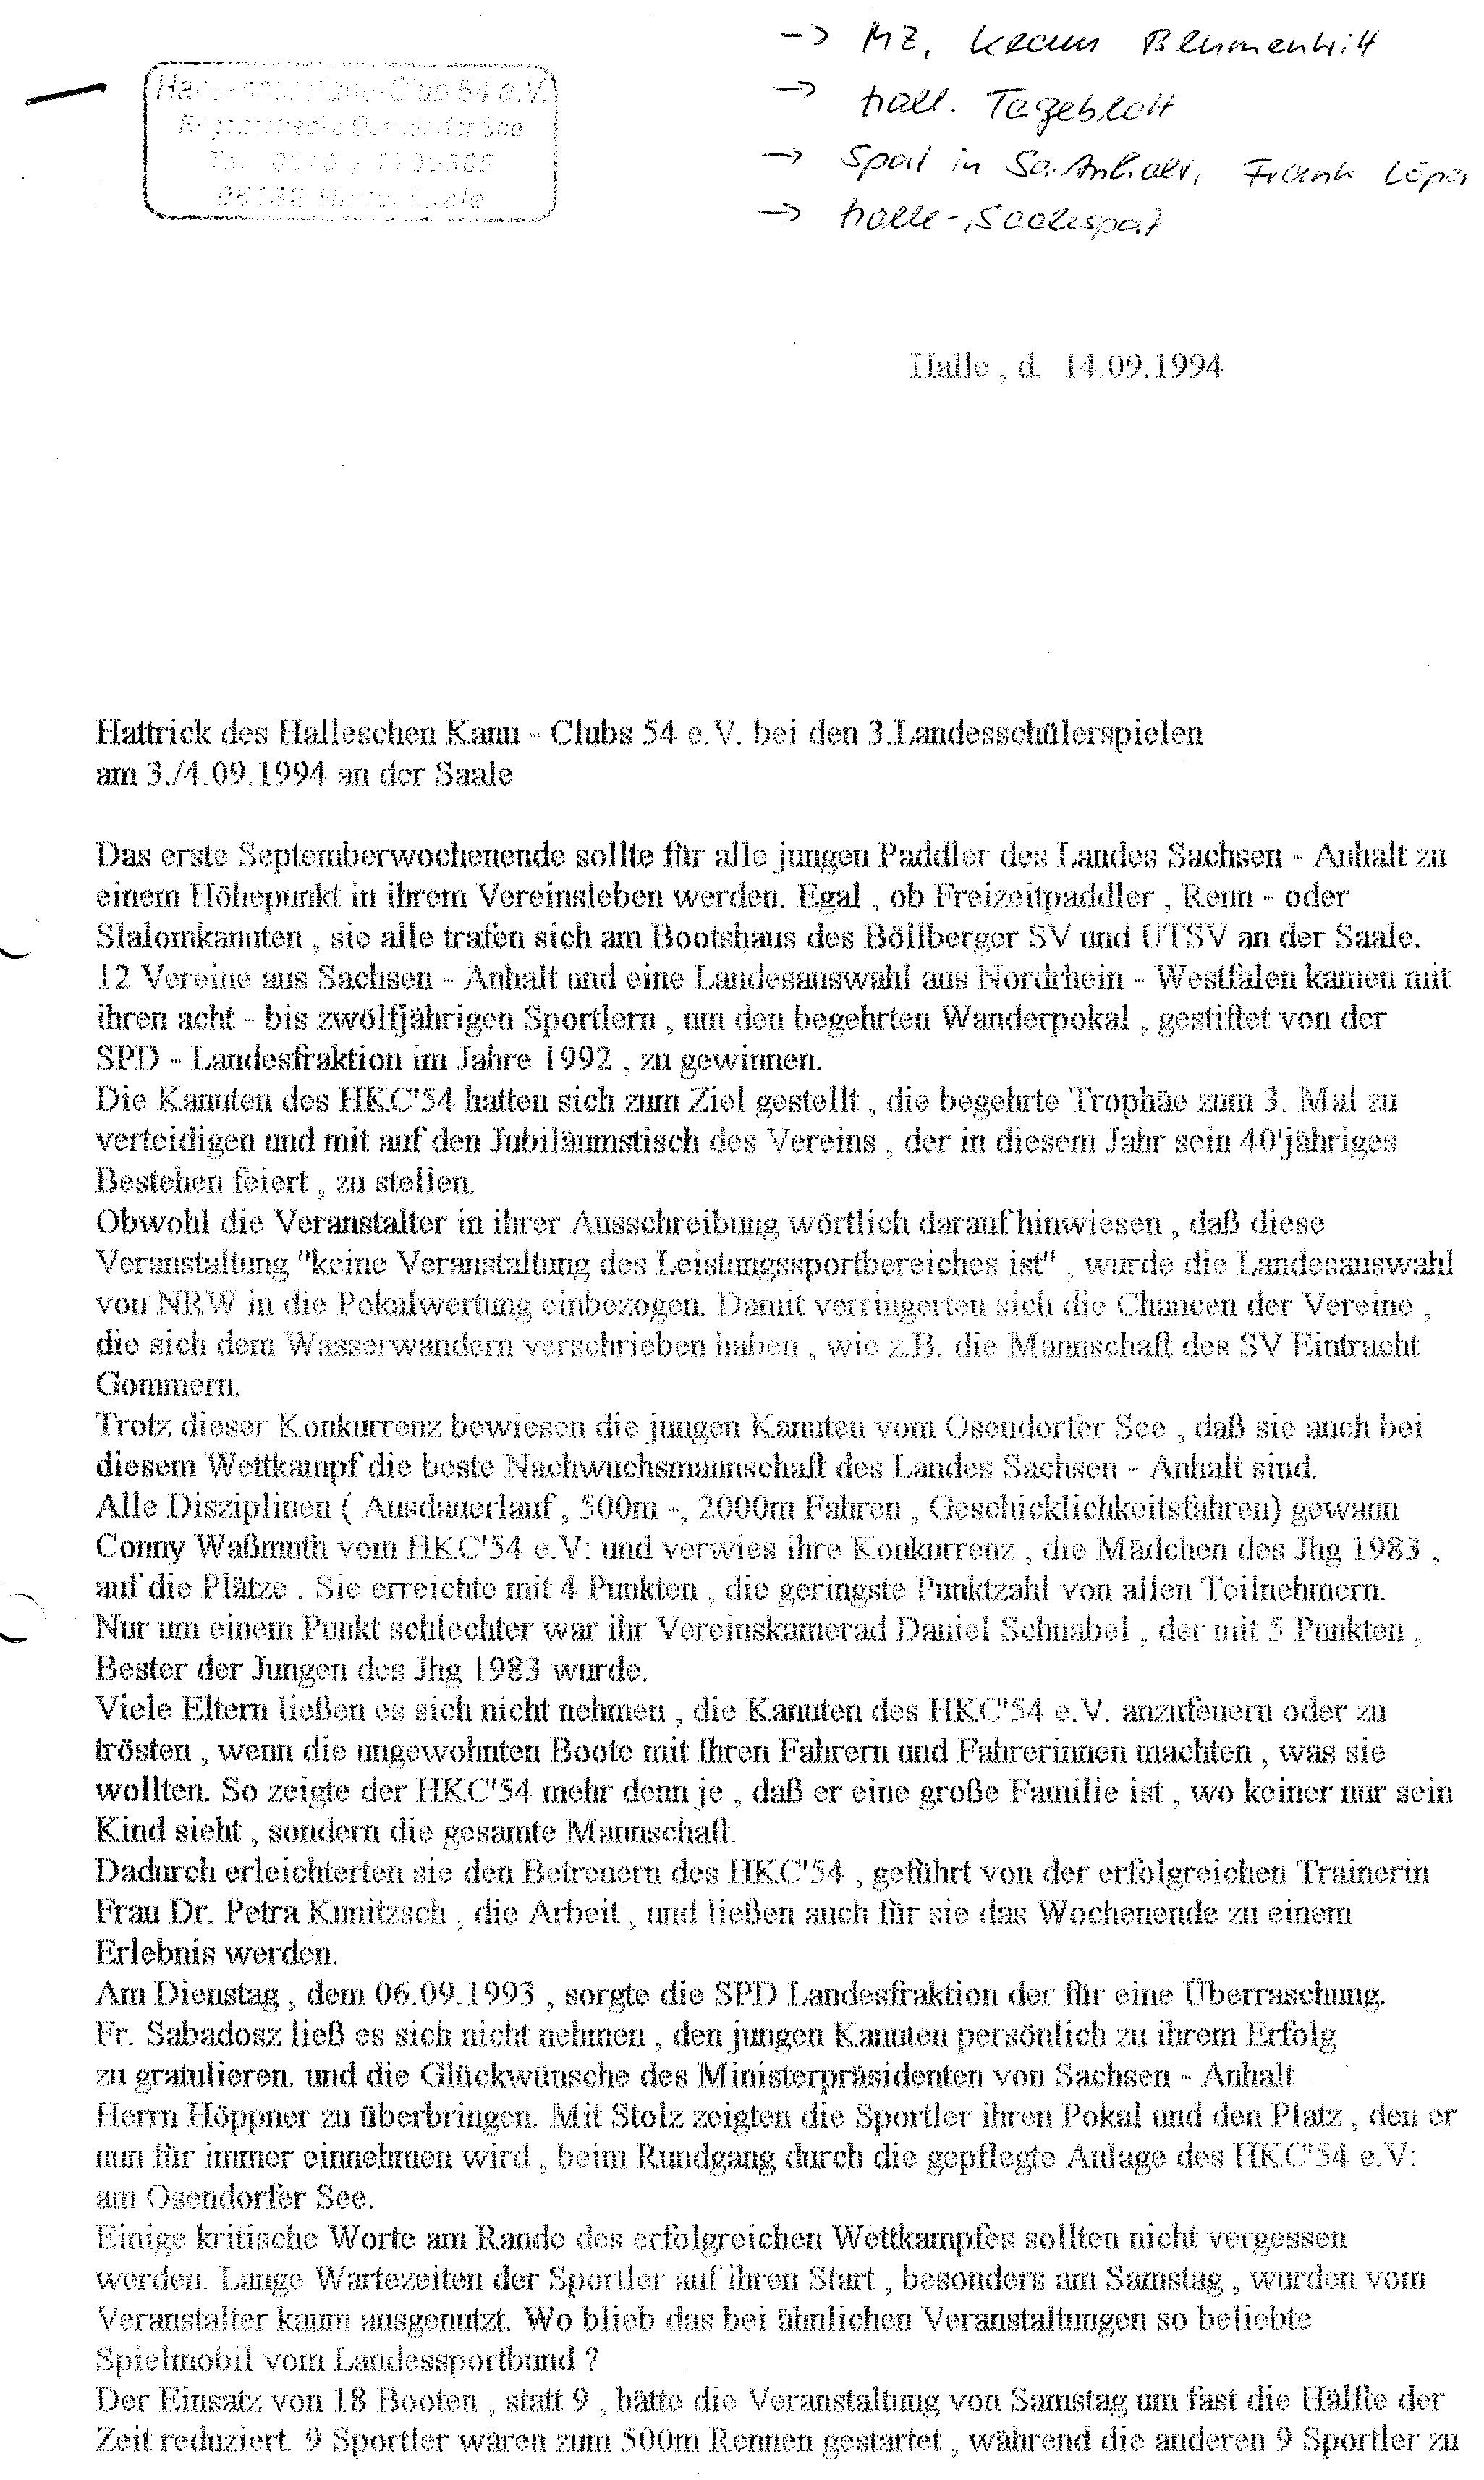 1994-09-14 PM Hattrick des HKC